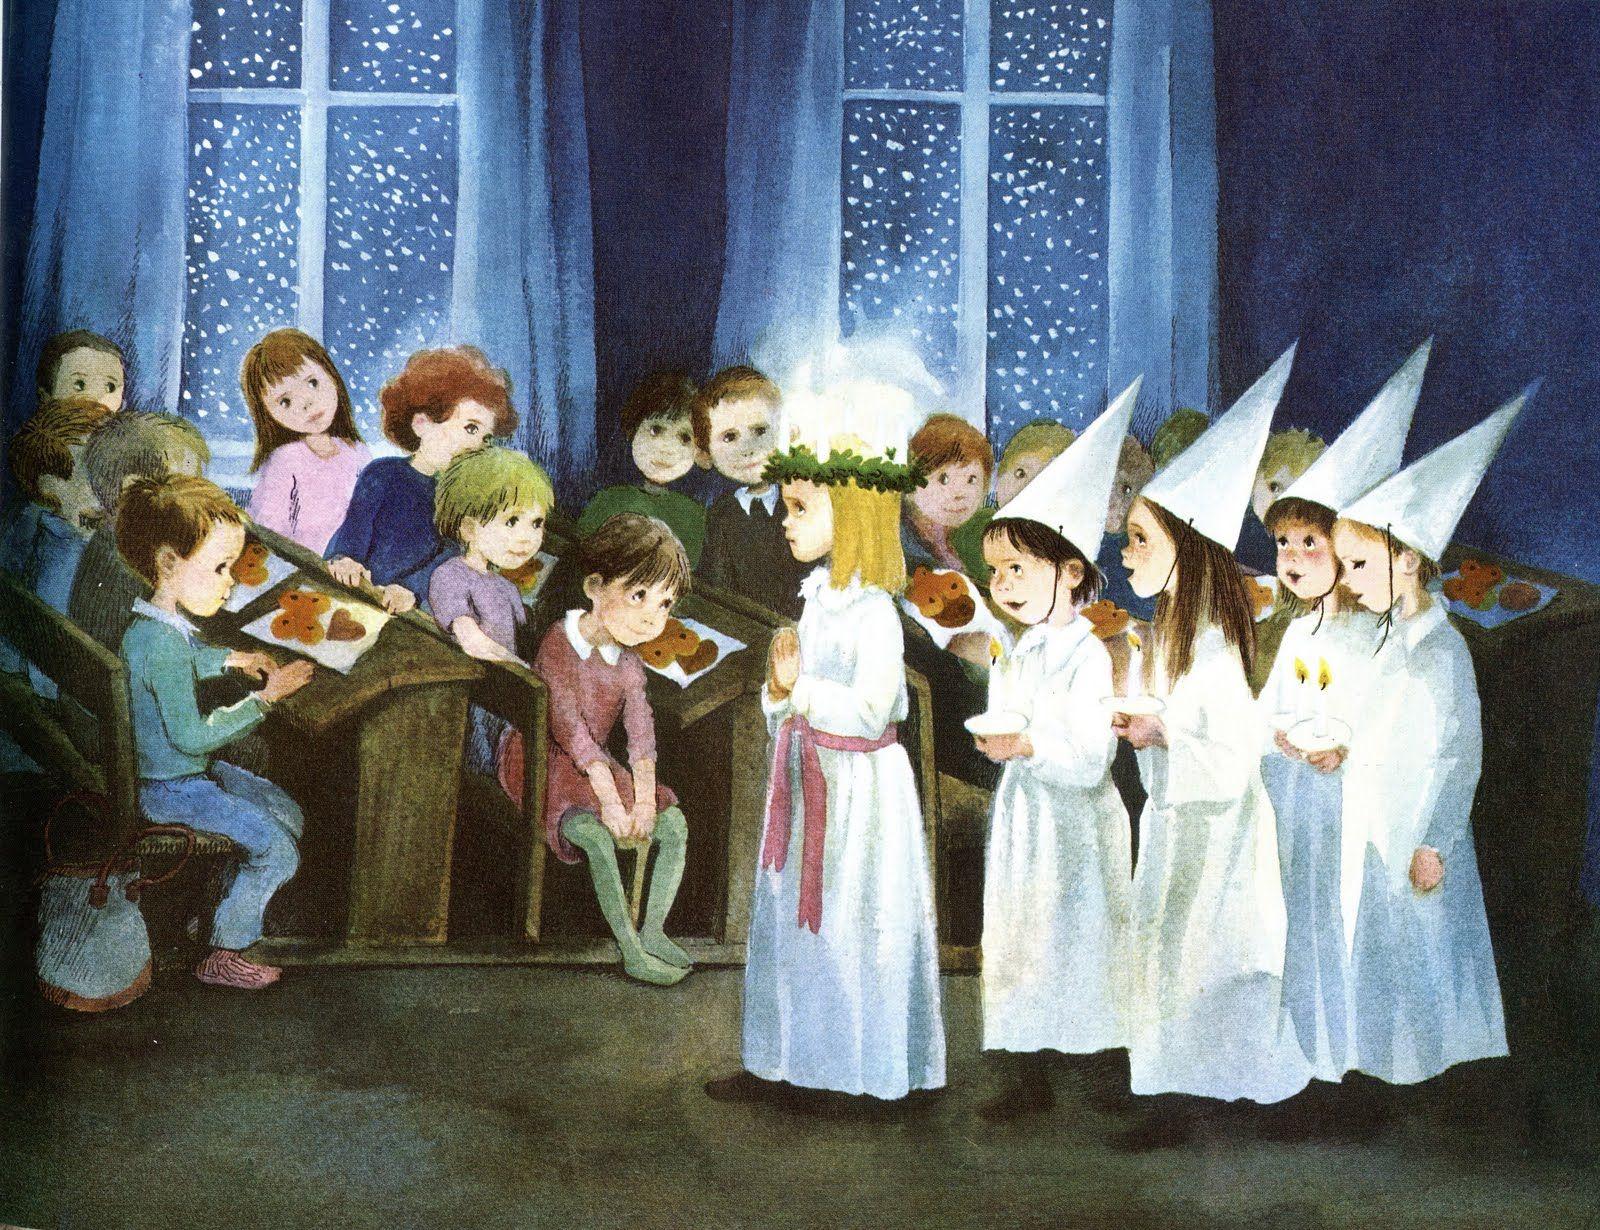 Sankta Lucia - 13 December every year - the saint of Light